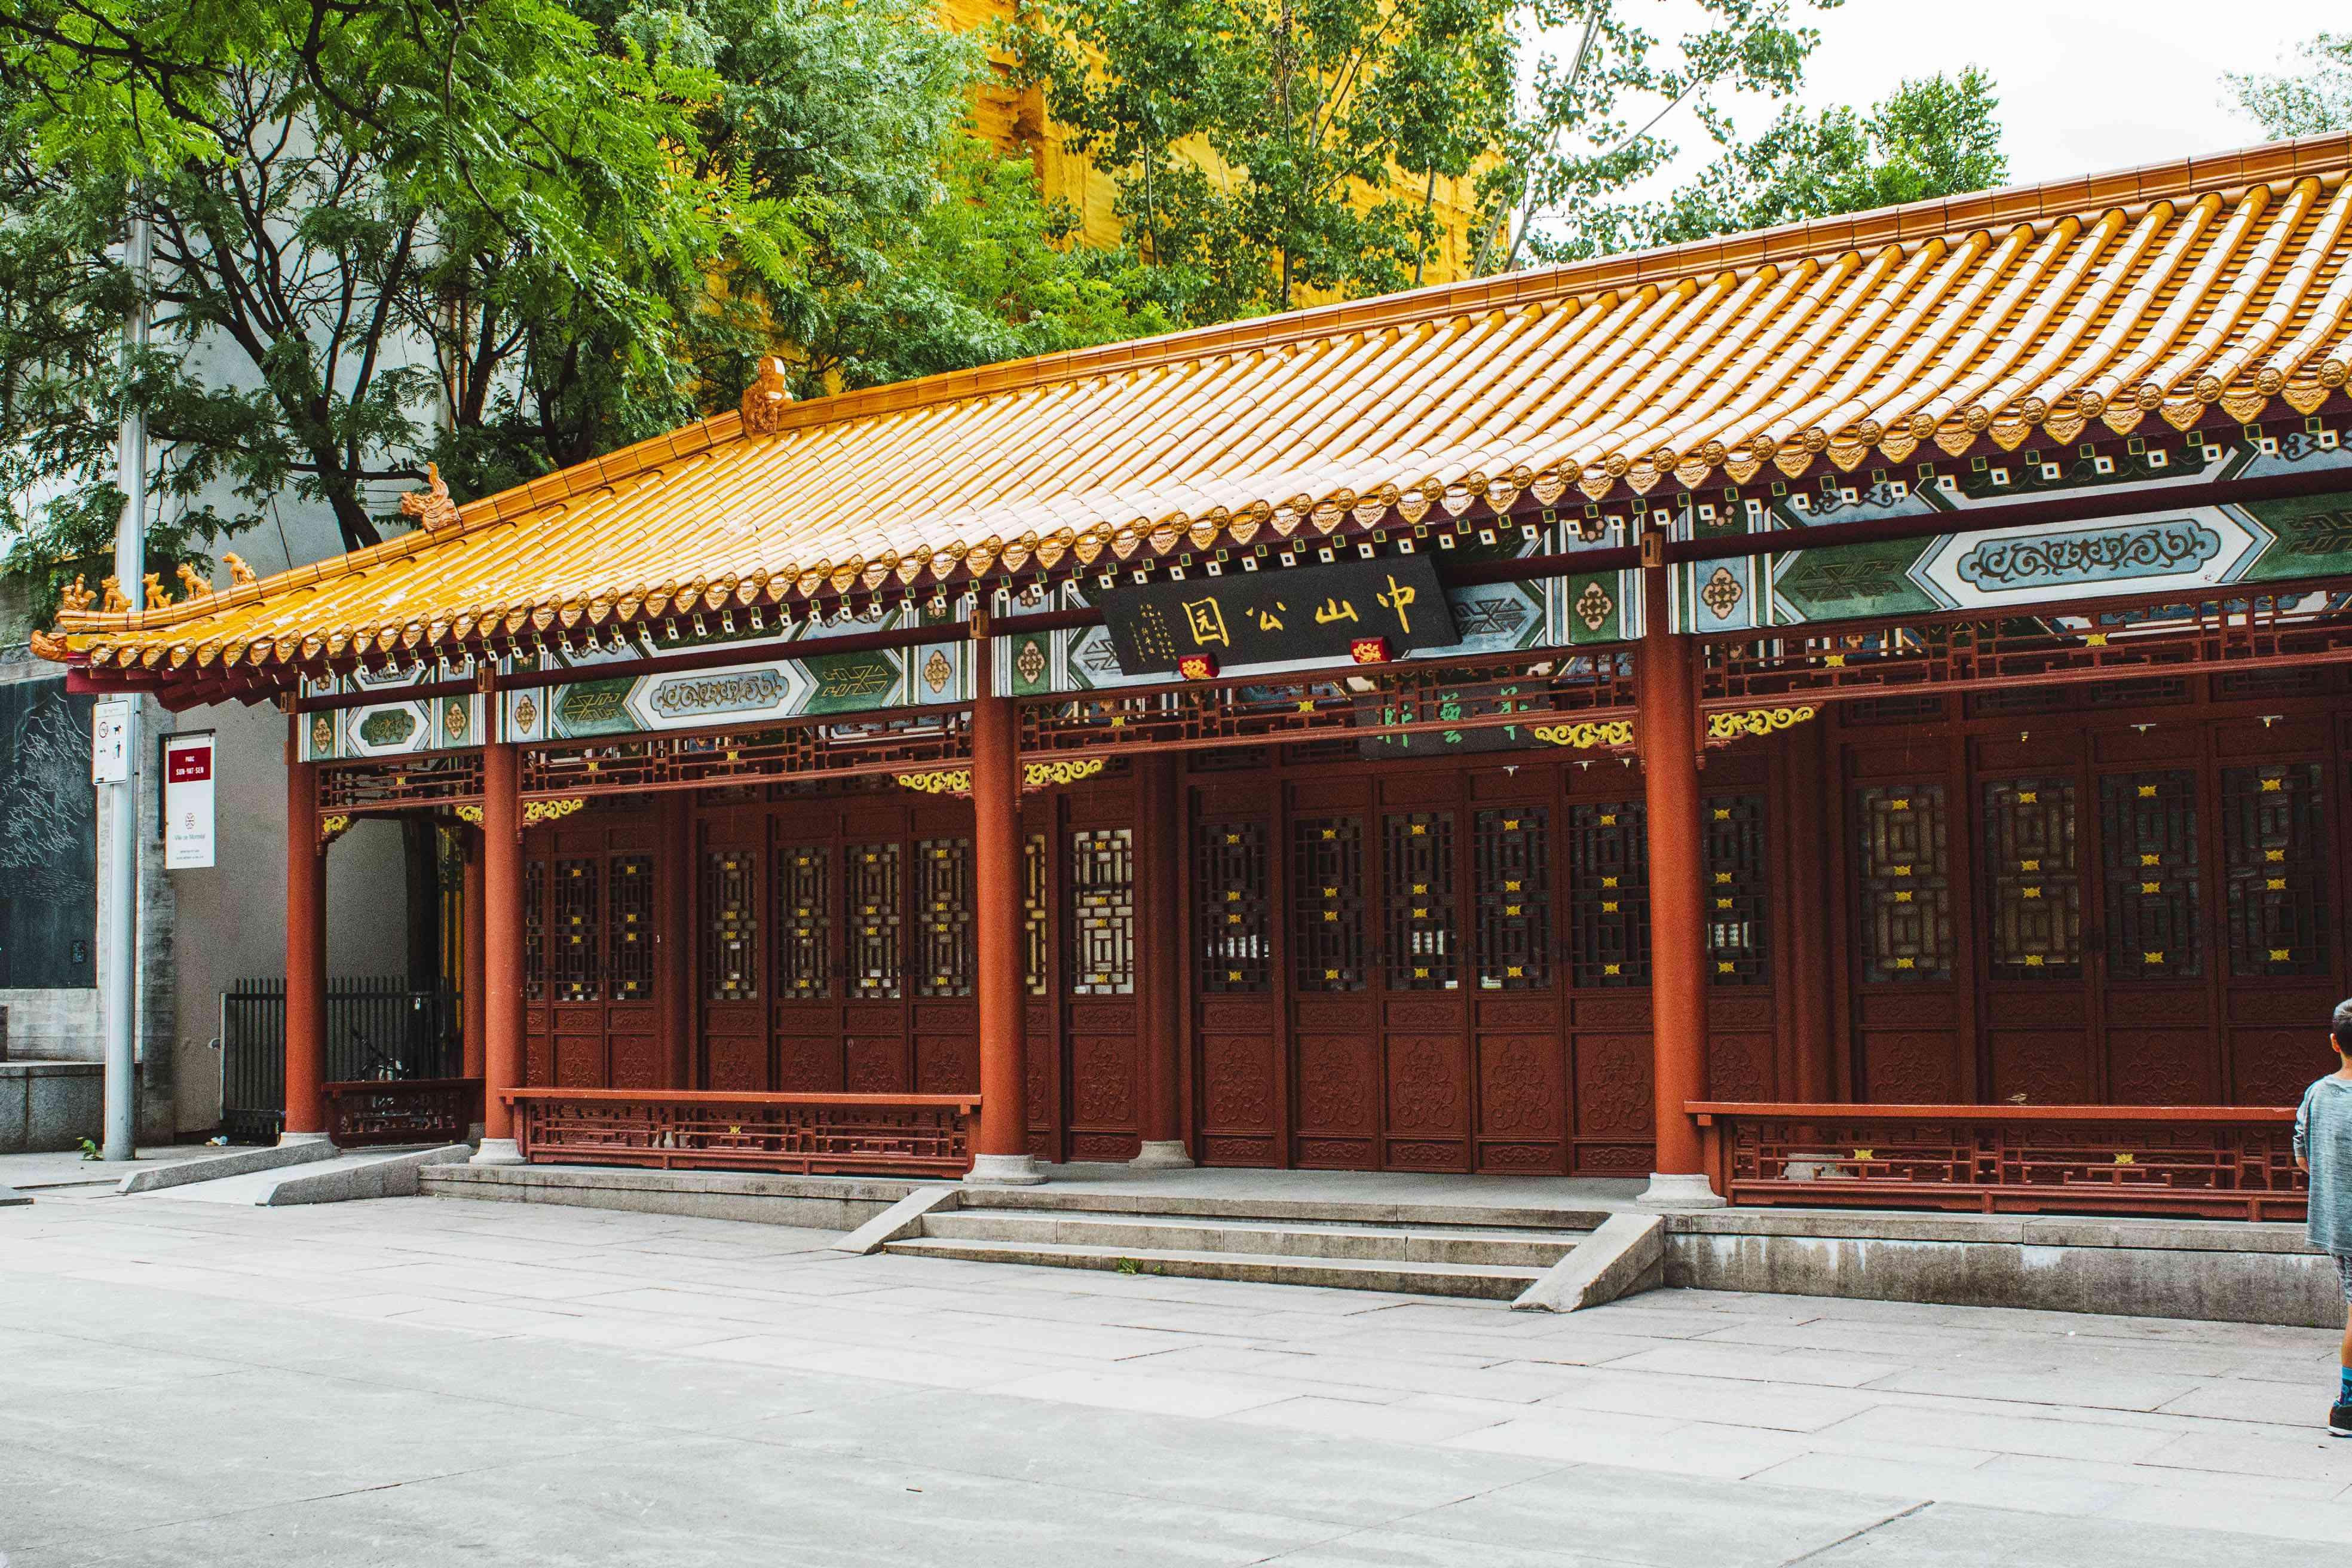 Montreal Chinatown's Sun Yat-Sen Square